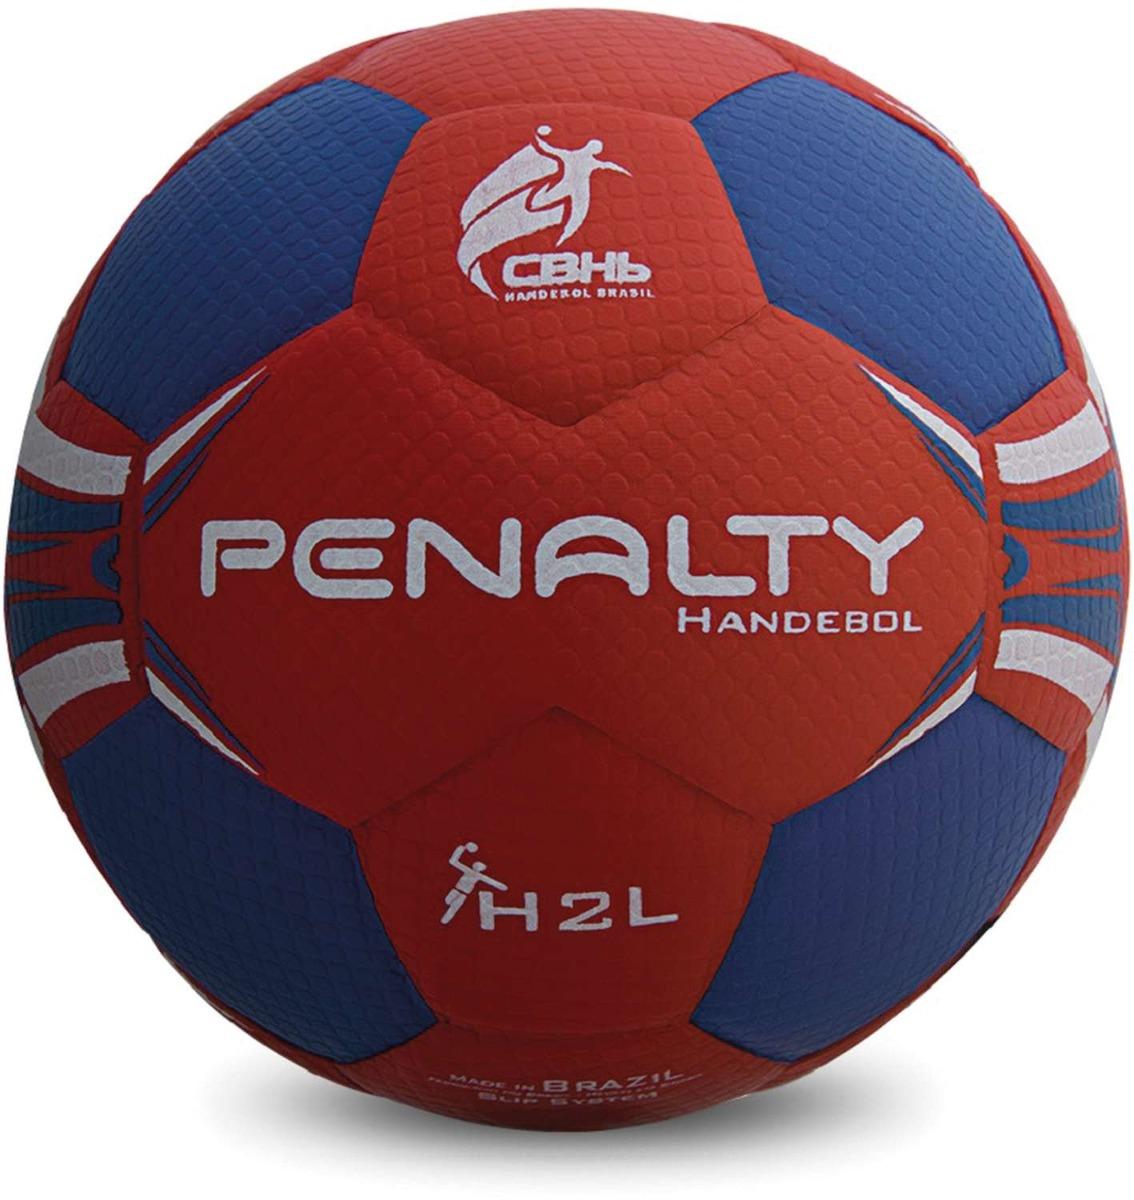 68056bff80 Bola De Handebol Hand Grip H2l Fem. S c Az-vm Penalty Un - R  158